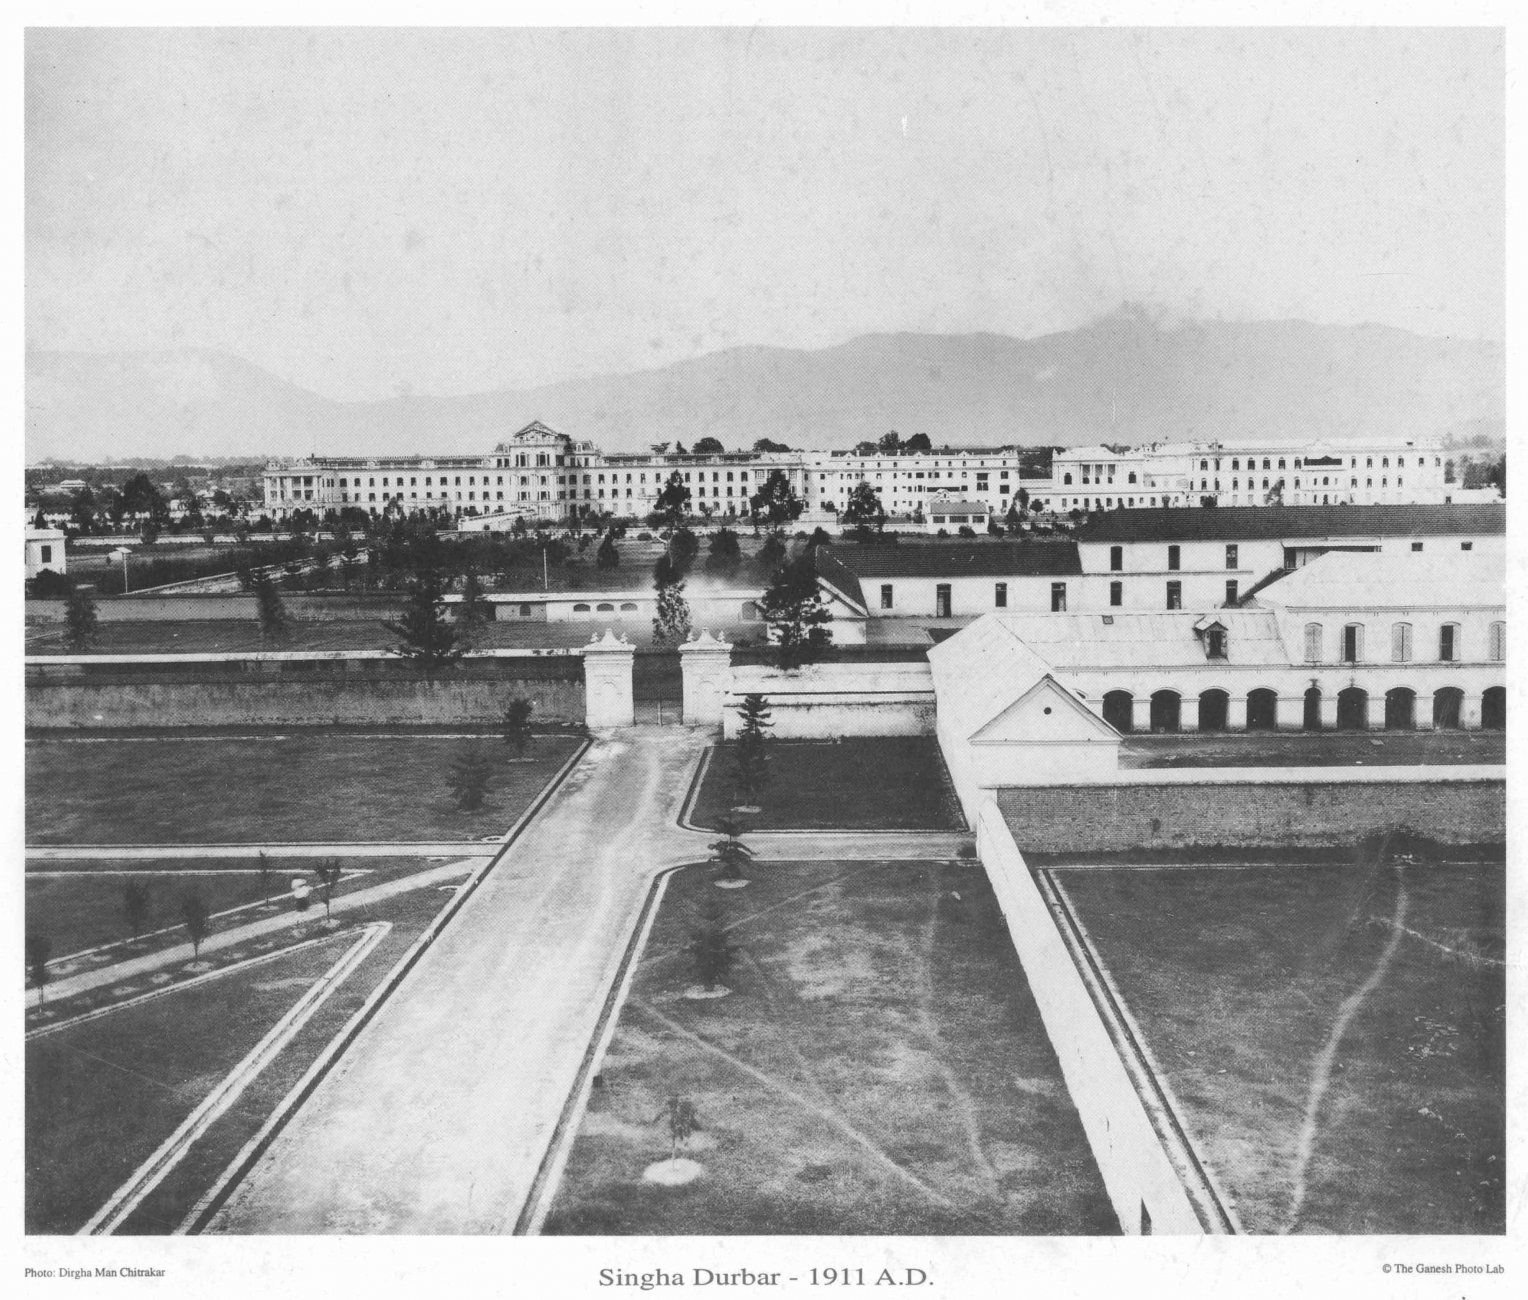 singh-durbar-1911ad.jpg